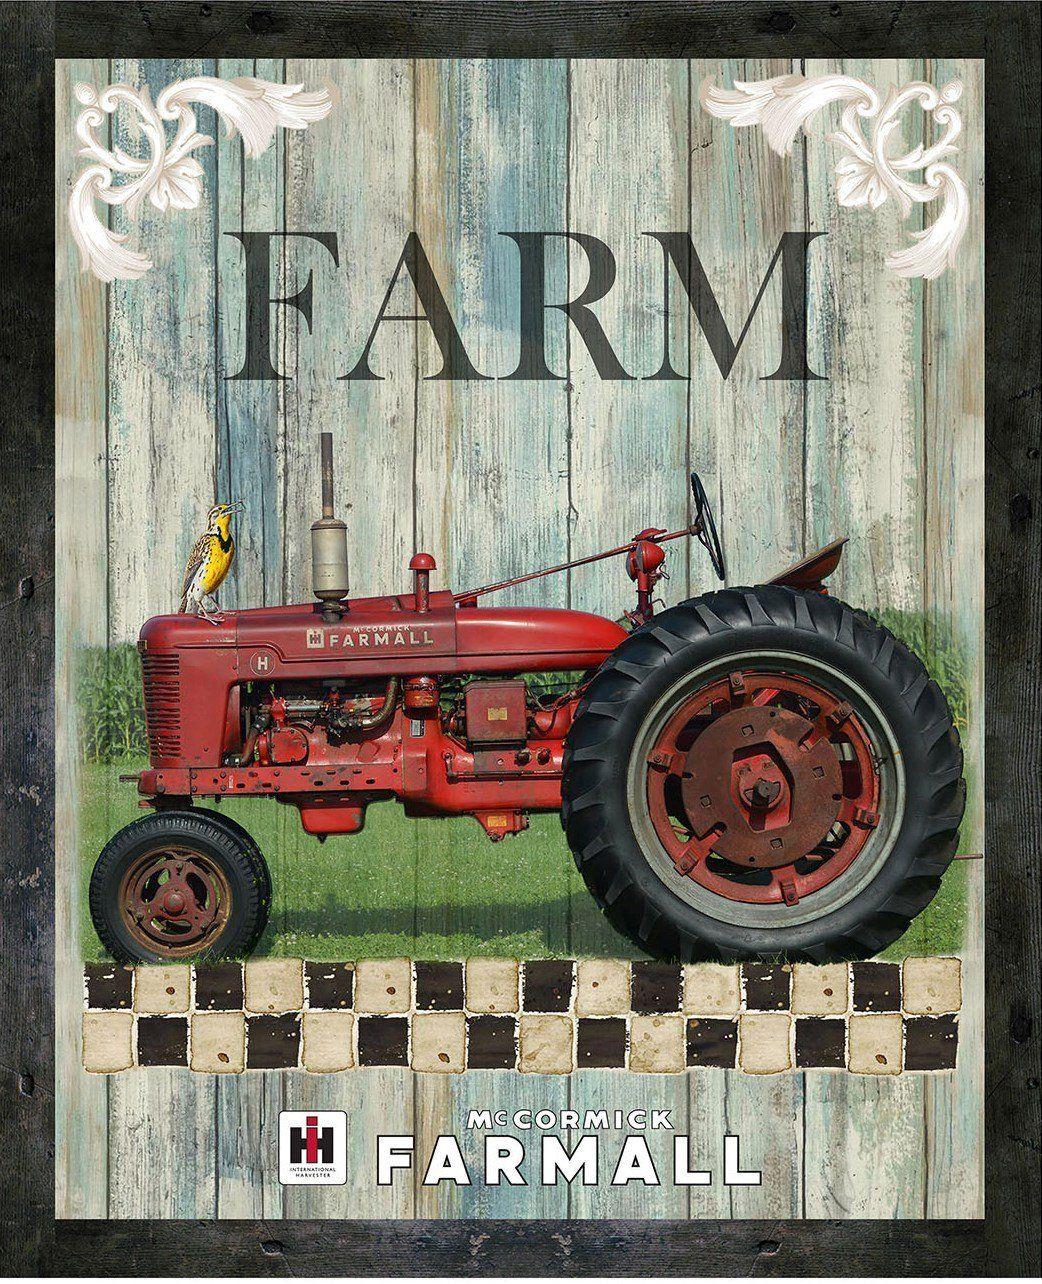 Farmall Tractors International Harvester Faith Farming BY YARDS Cotton Fabric